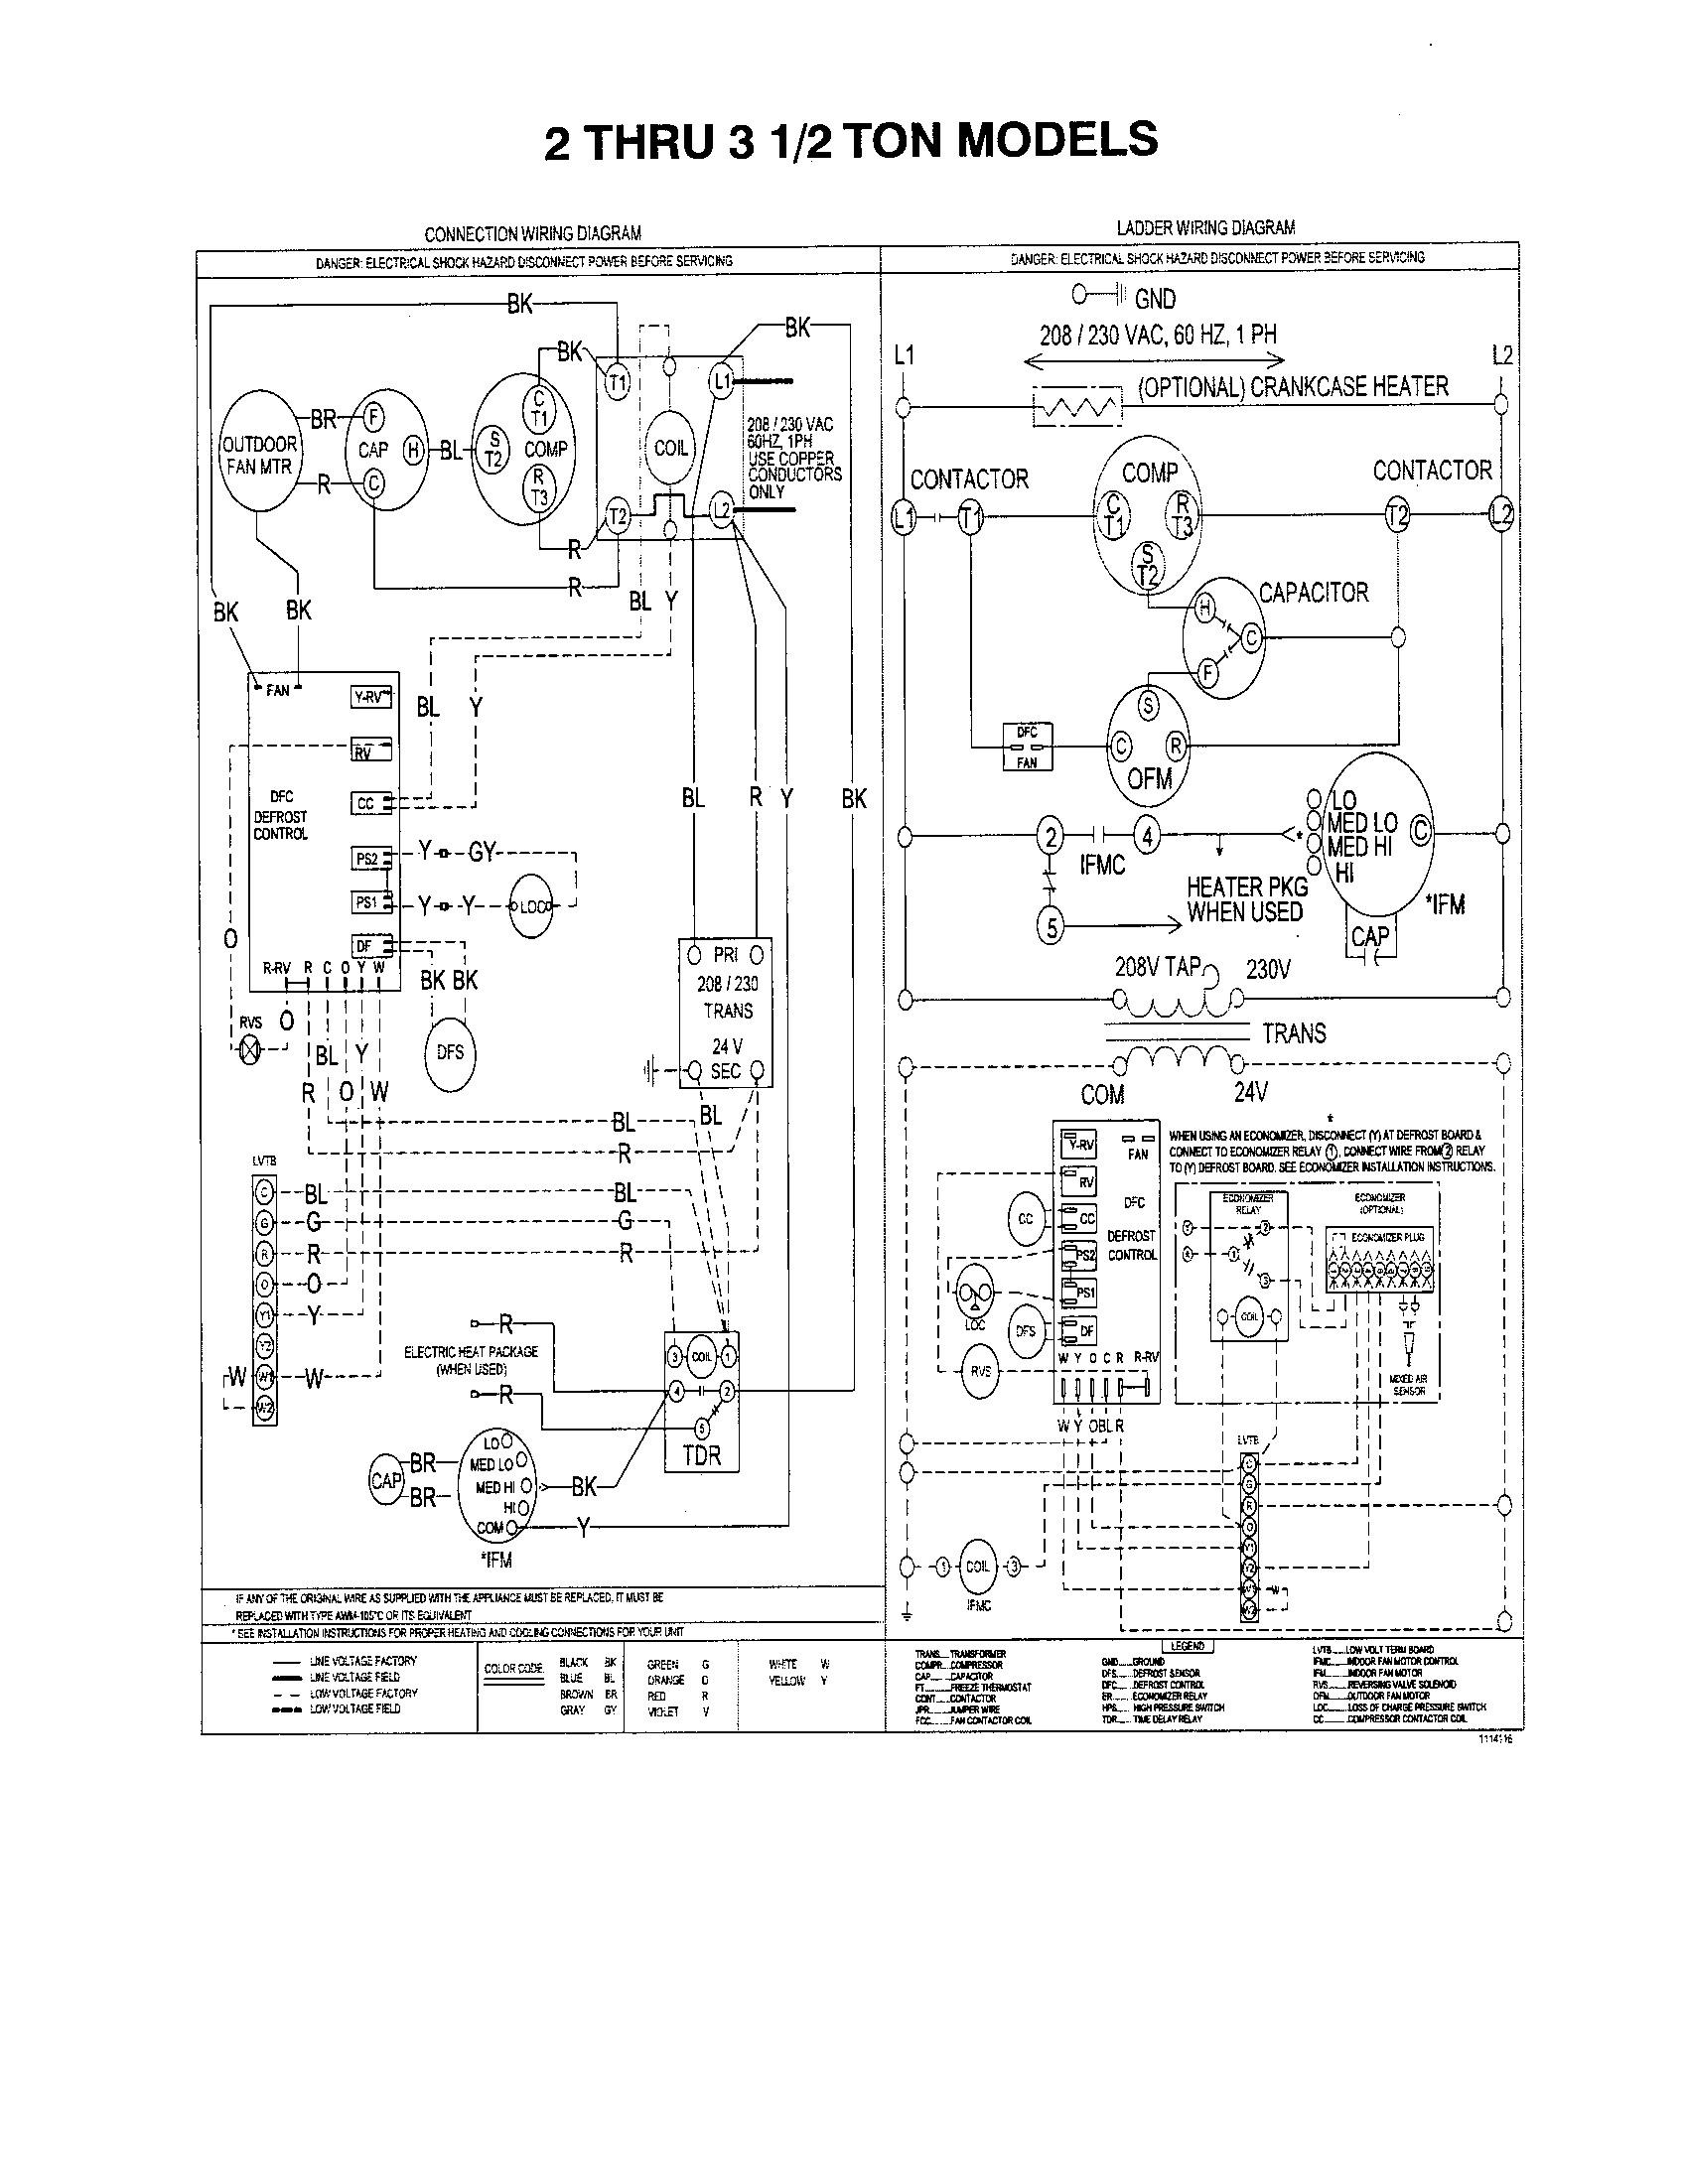 Trane Weathertron thermostat Wiring Diagram Stunning Trane Weathertron thermostat Wiring Diagram Gallery Of Trane Weathertron thermostat Wiring Diagram